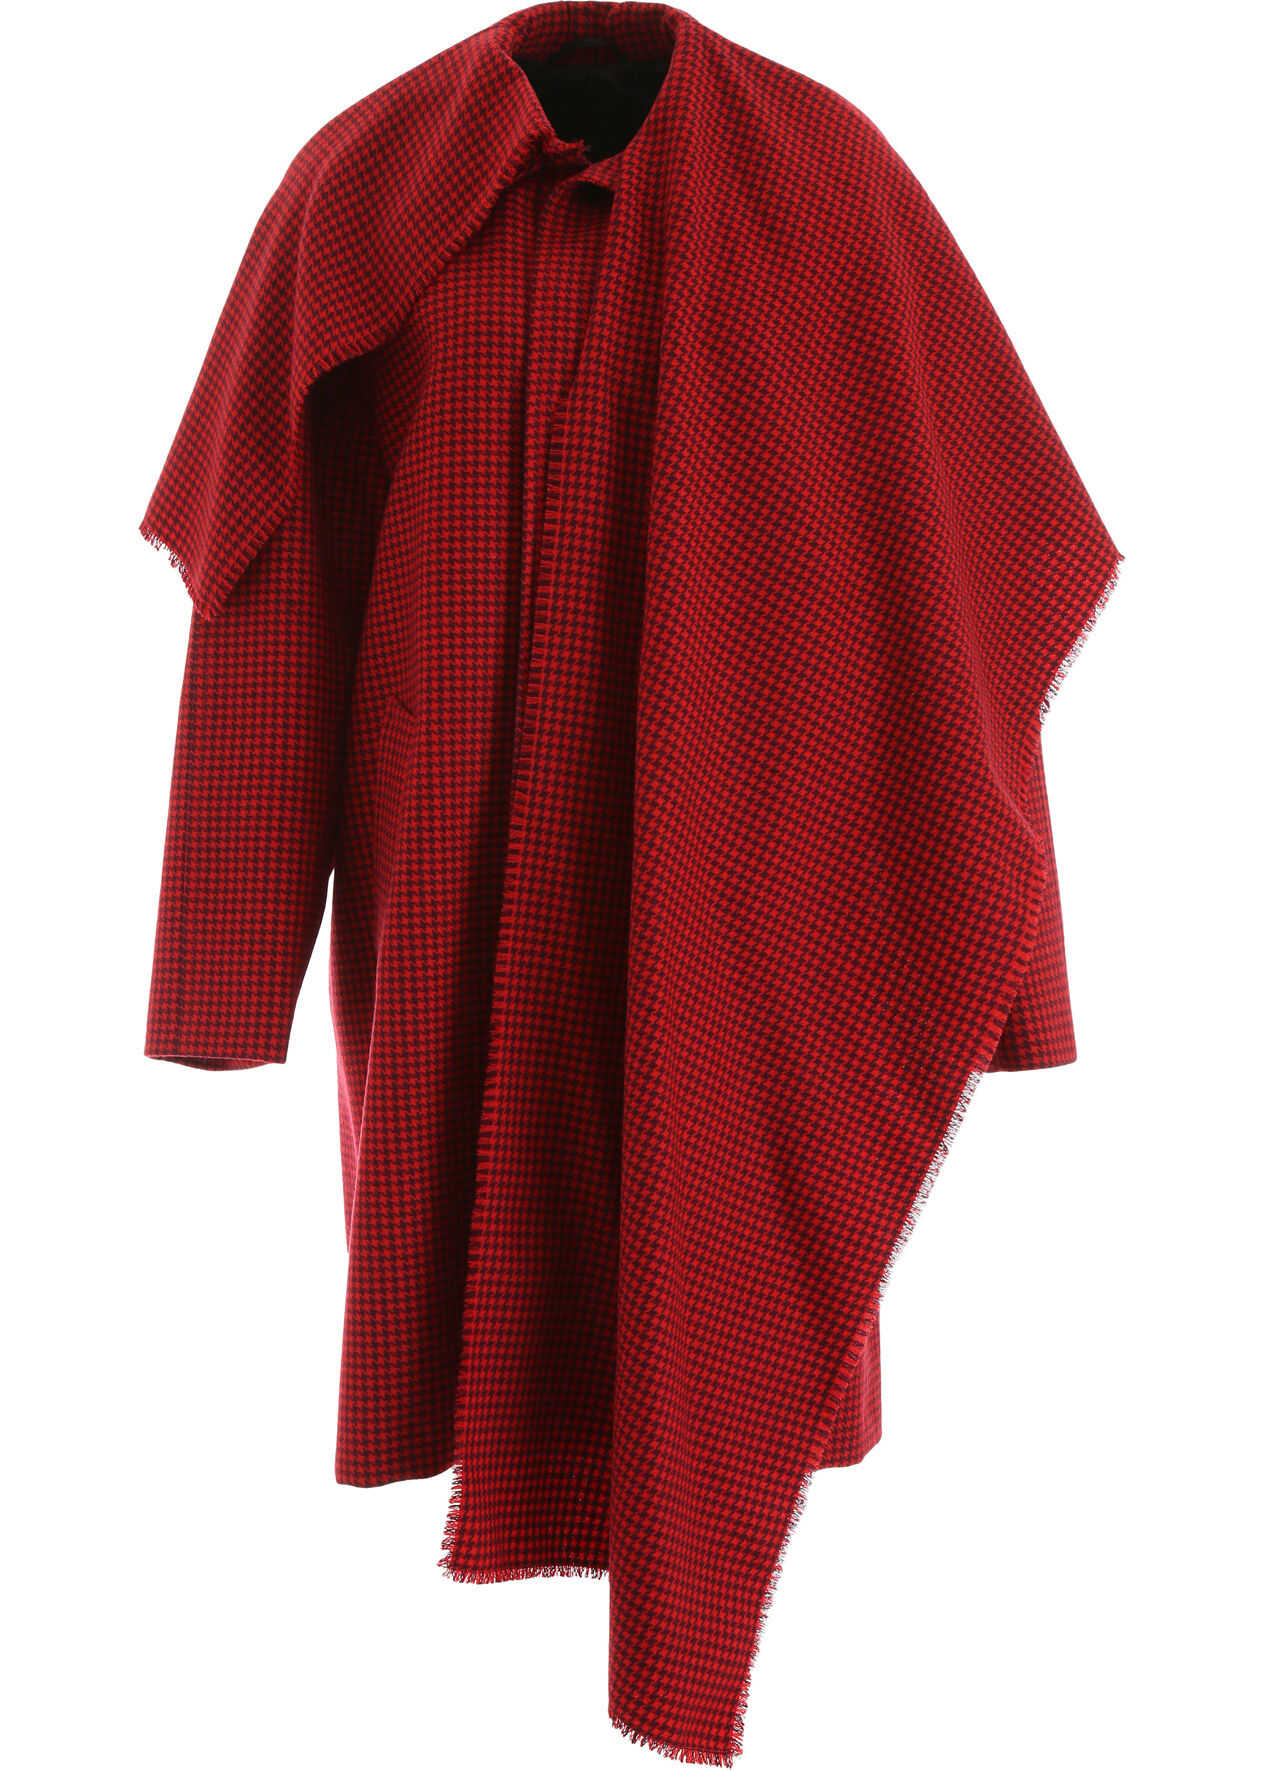 Balenciaga Houndstooth Coat RED